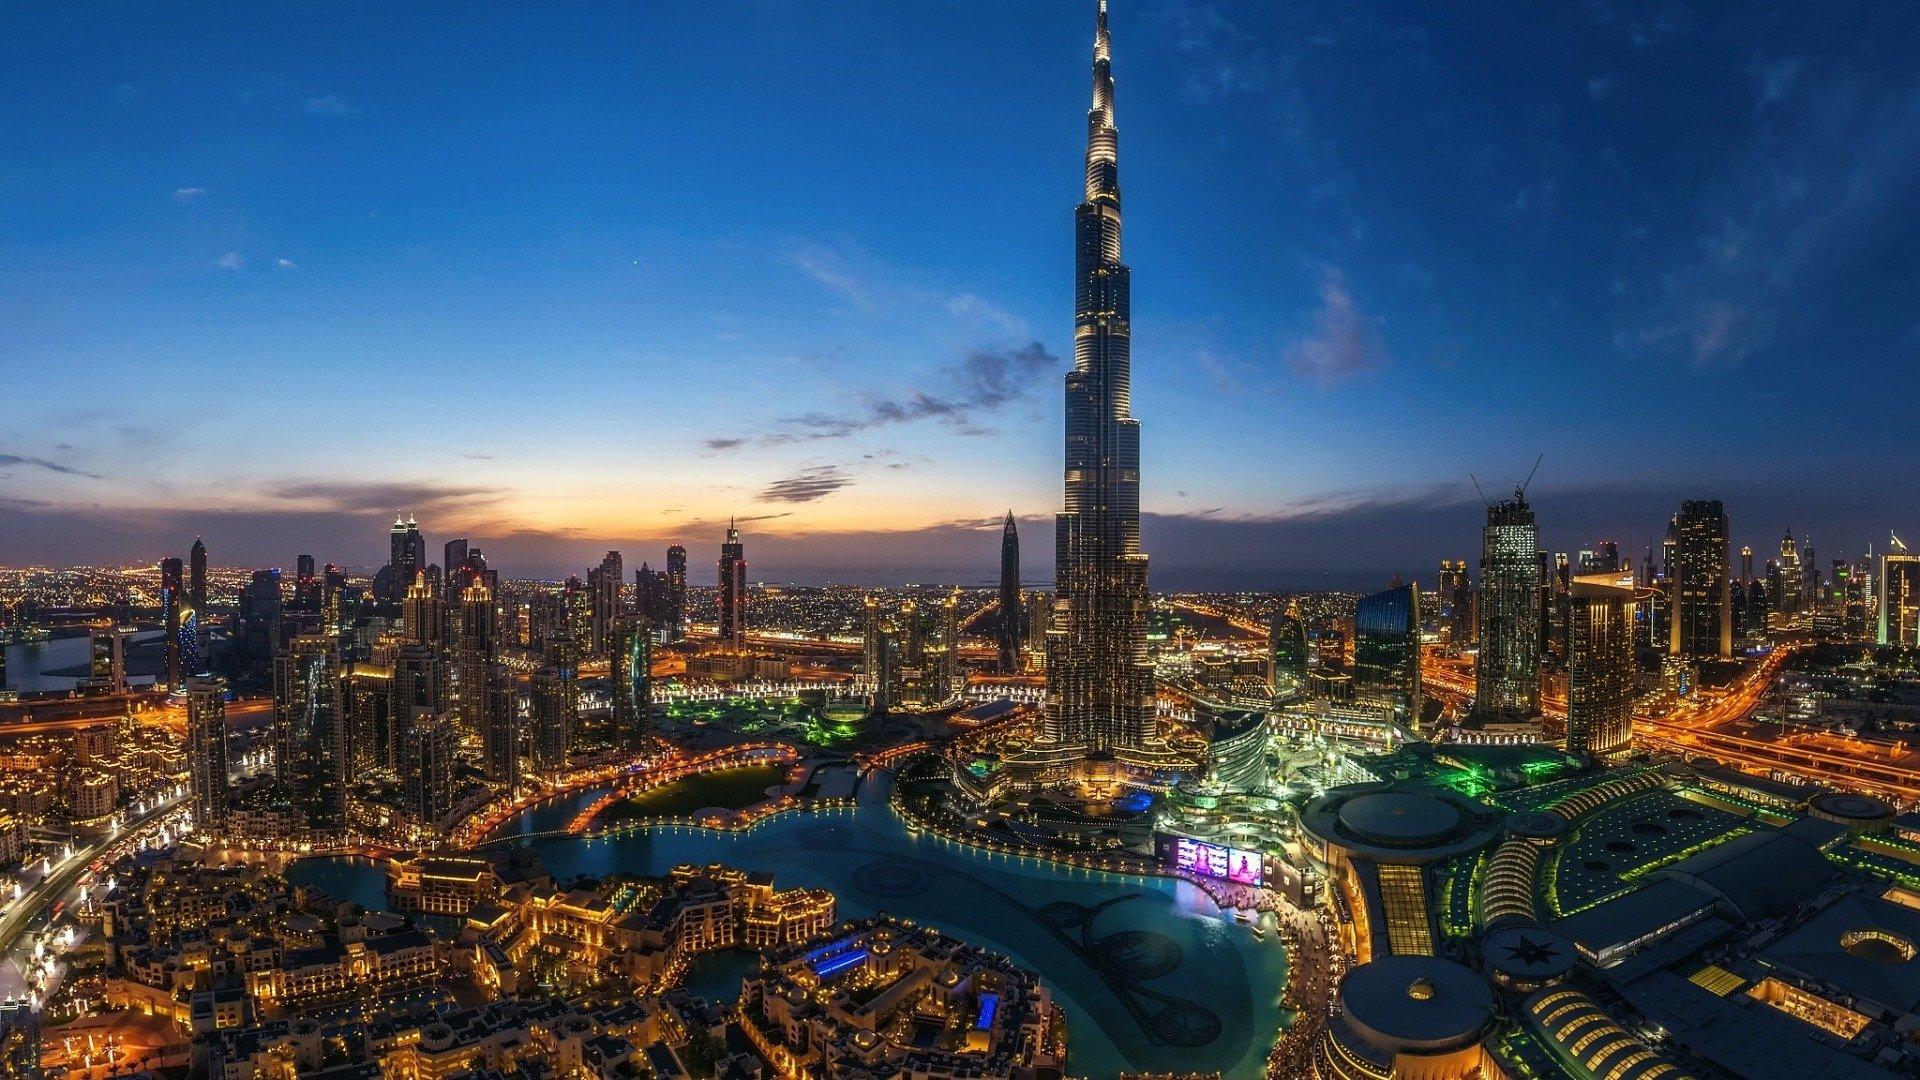 Night Lights In Dubai Wallpaper - Burj Khalifa Night 4k , HD Wallpaper & Backgrounds